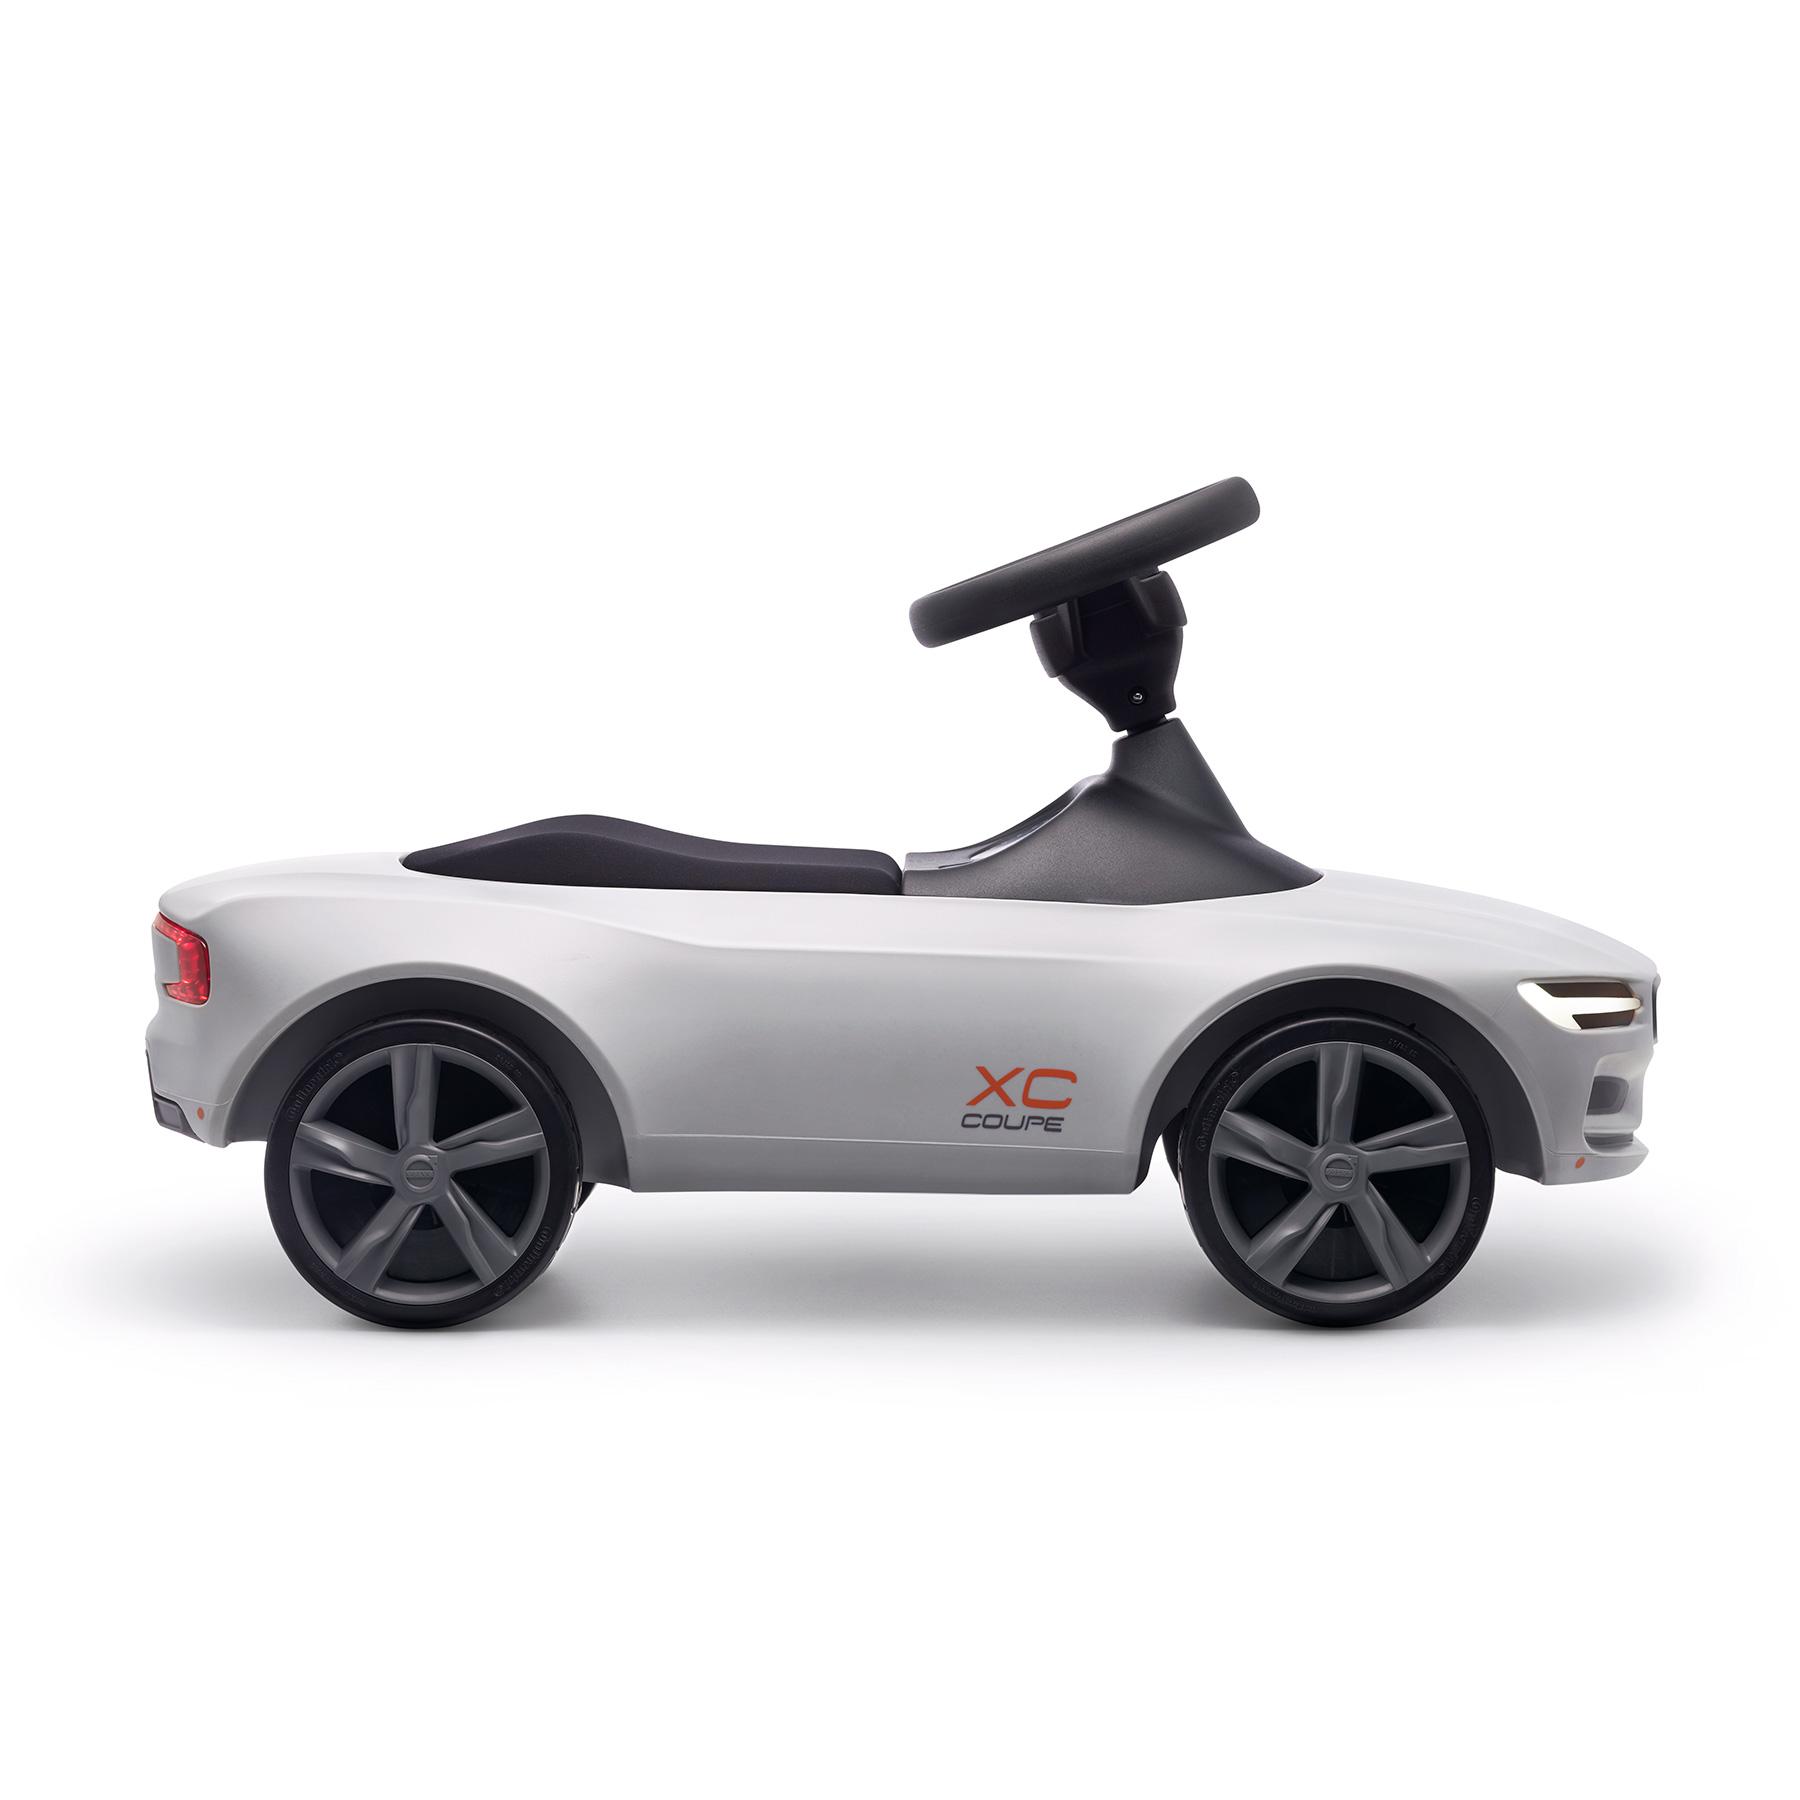 volvo car lifestyle collection shop volvo car rider concept xc coupe